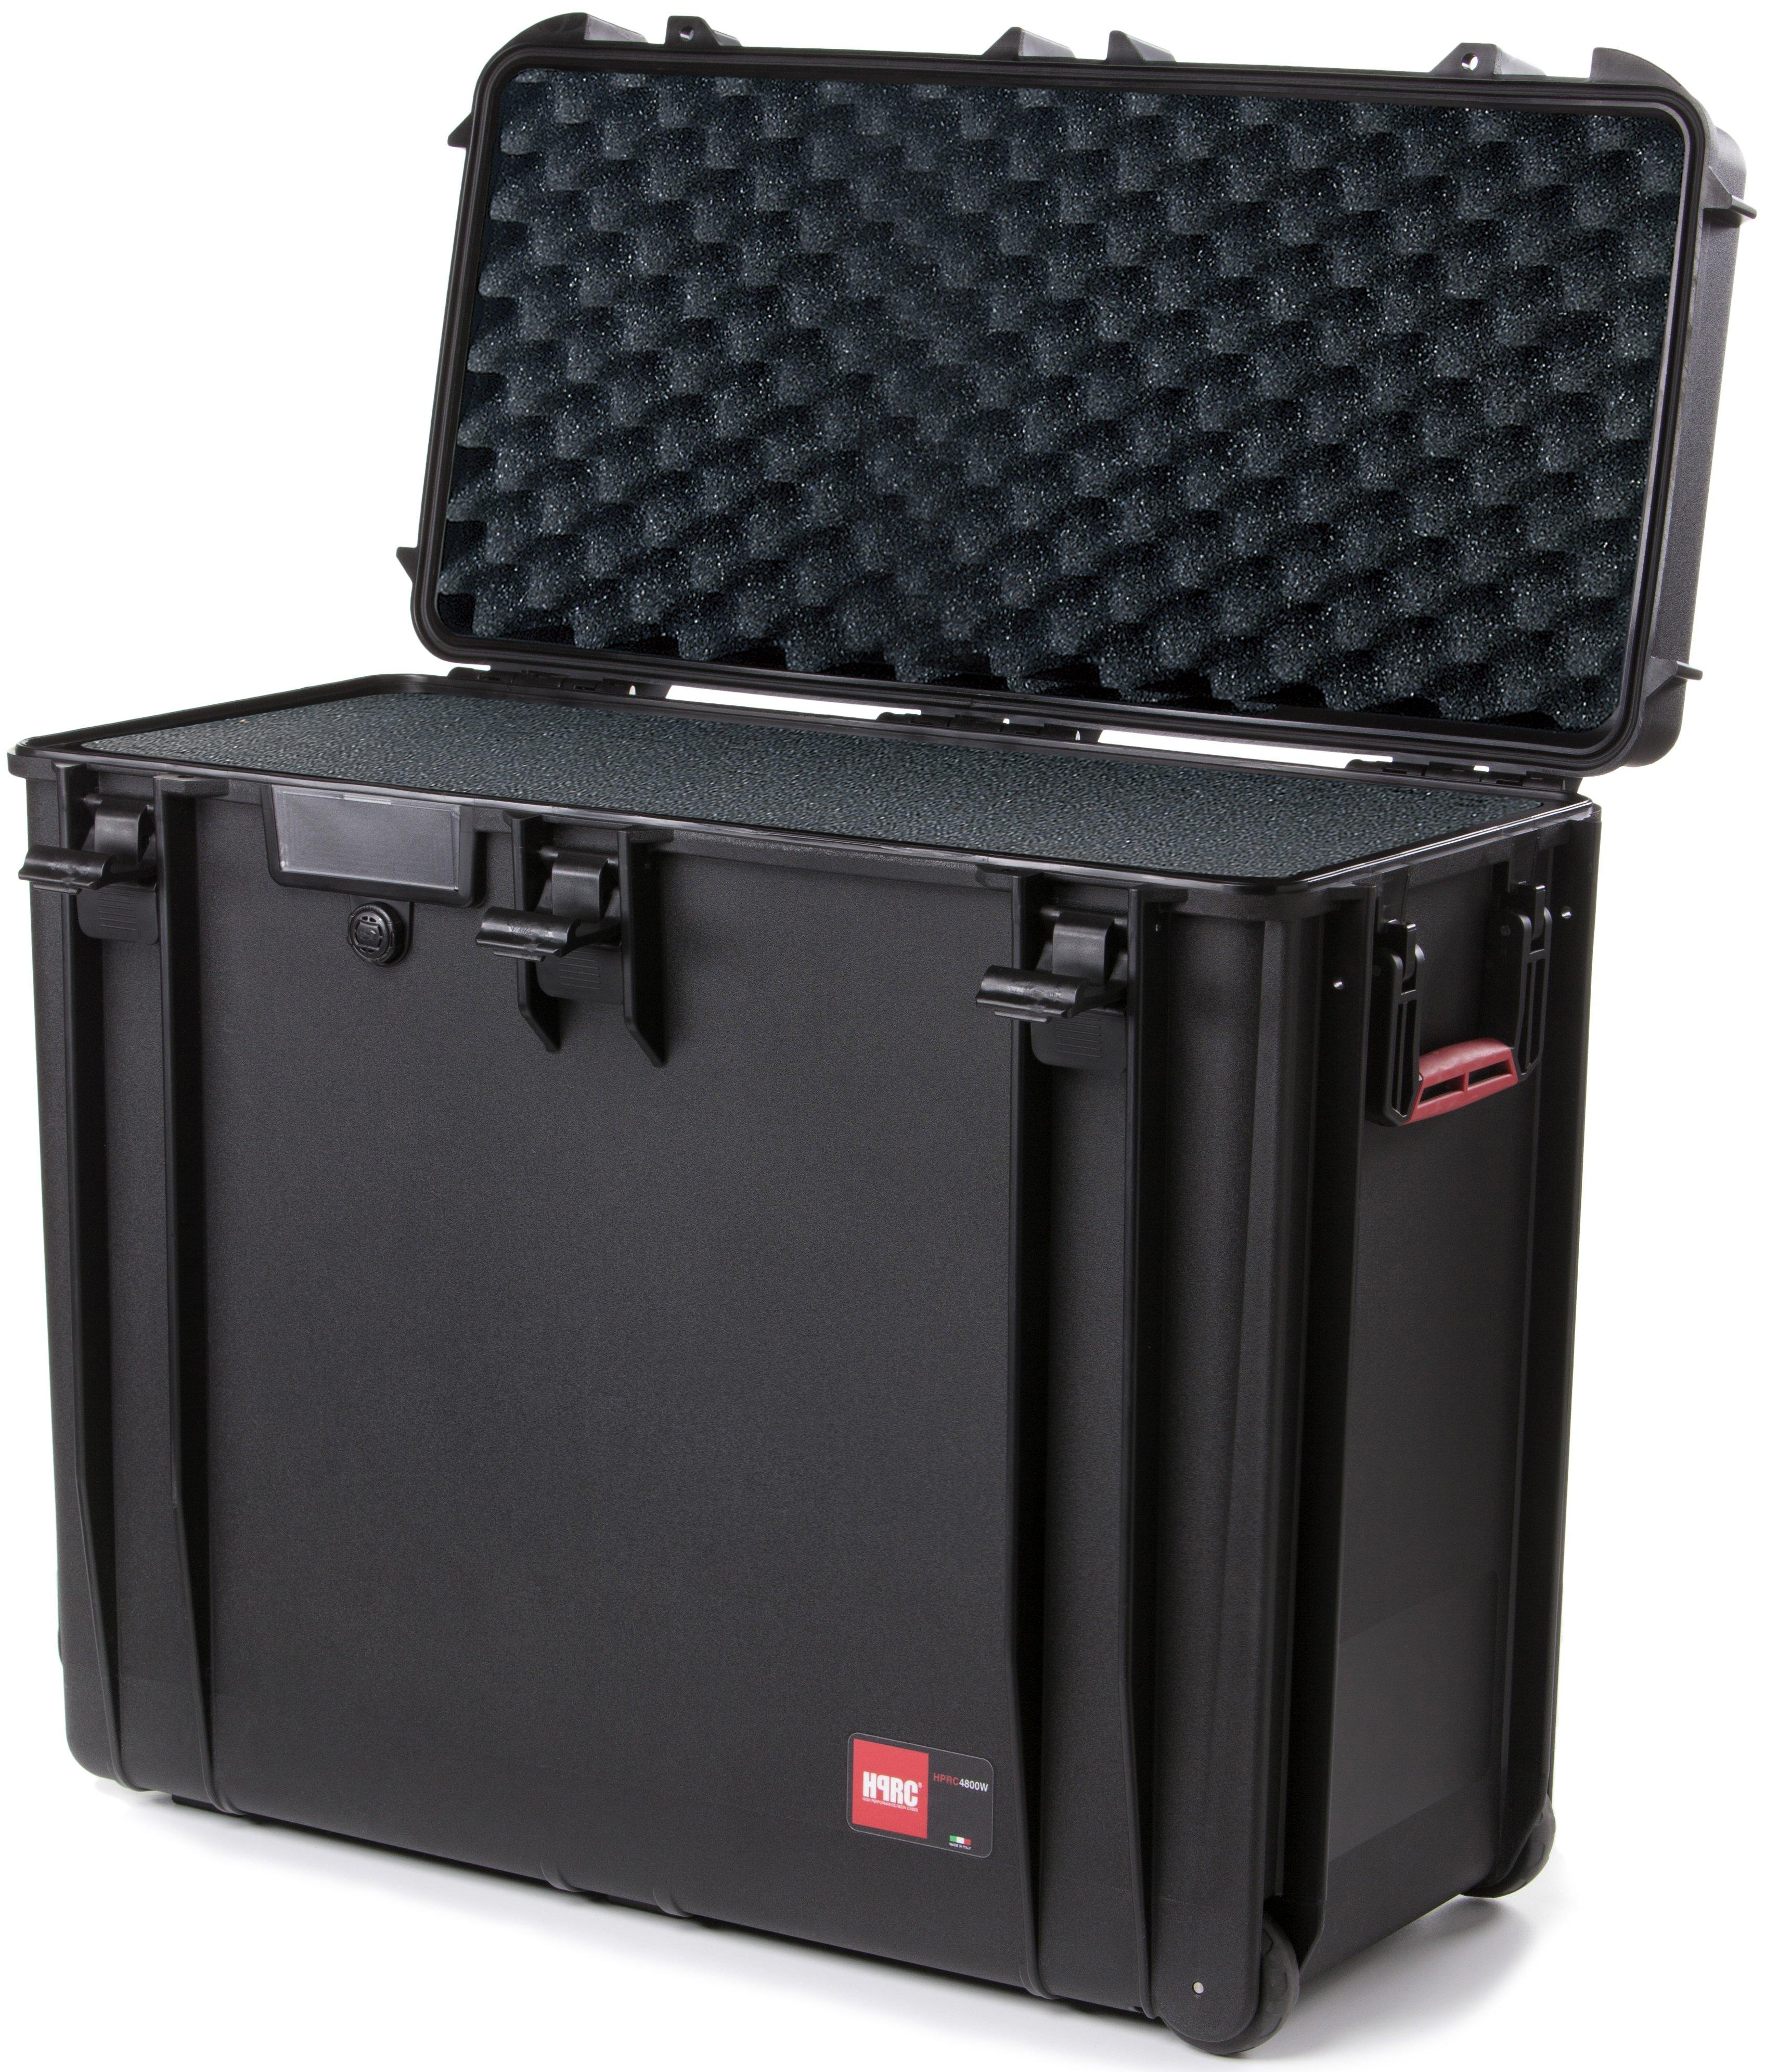 HPRC 4800W Case